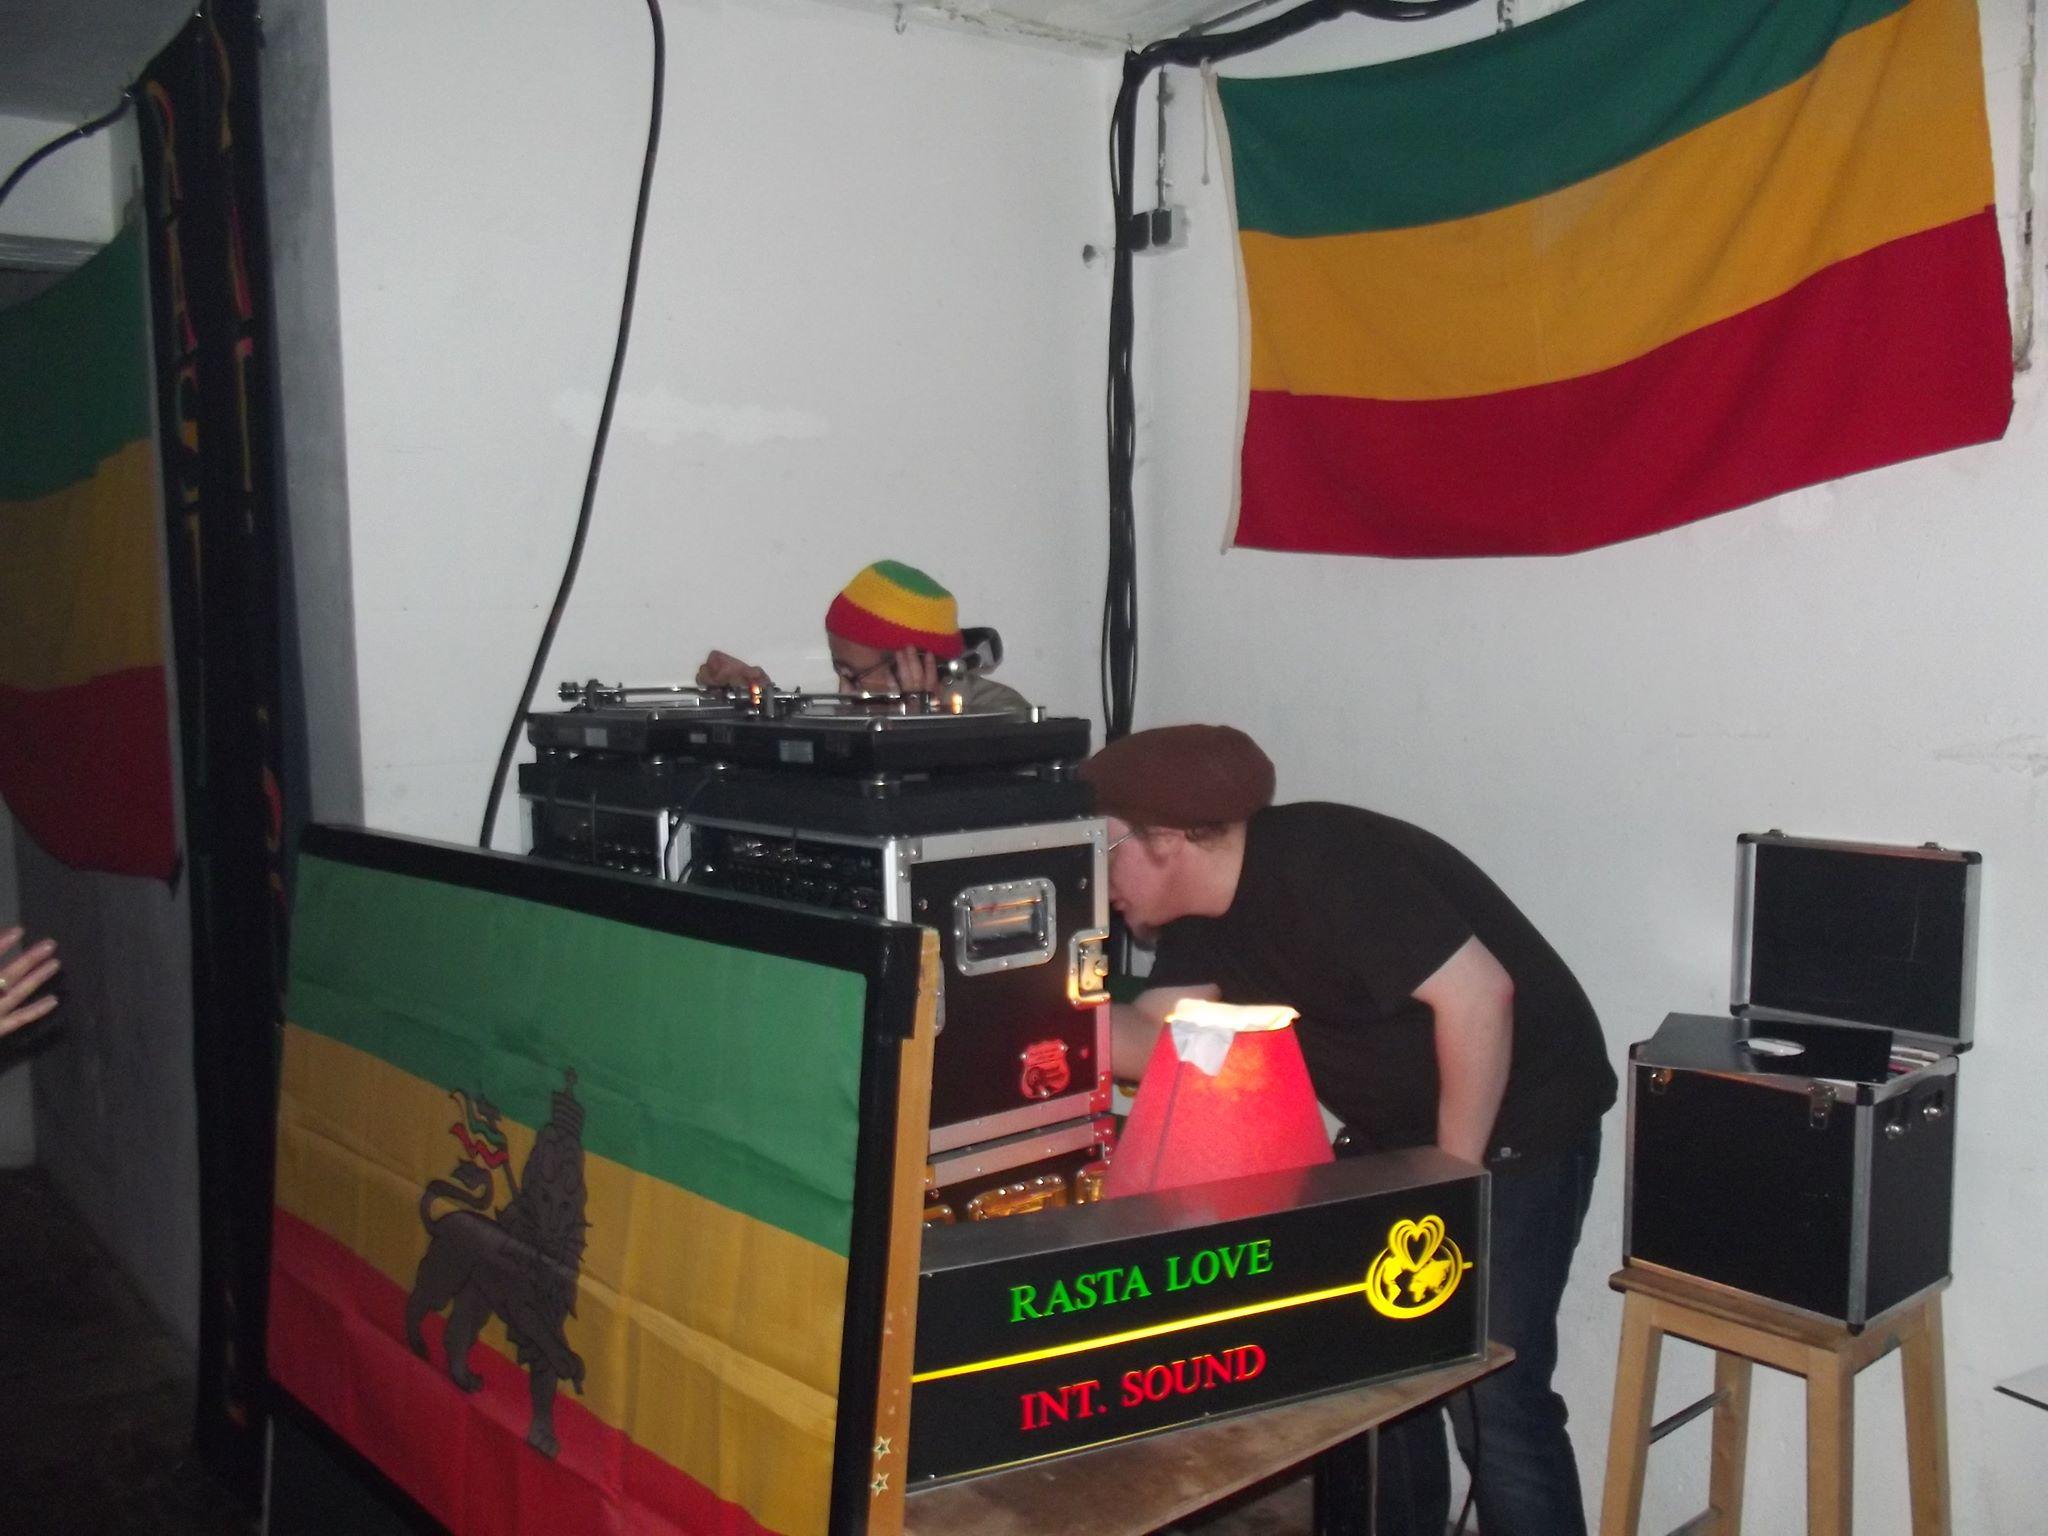 Rasta Love Int. + SlamJam @ Vondelbunker